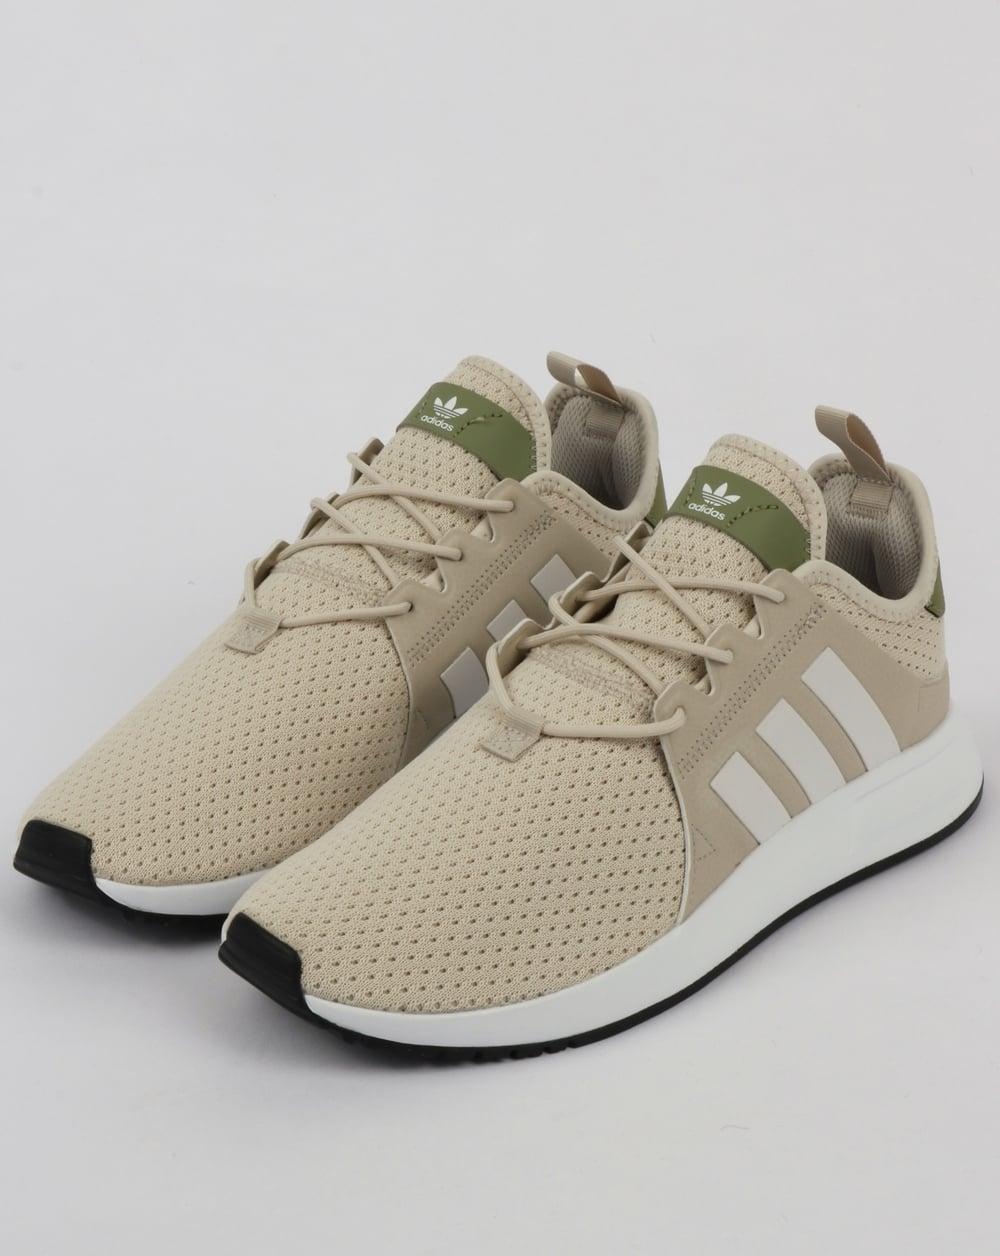 Adidas X_PLR Trainers Clear Brown, XPLR